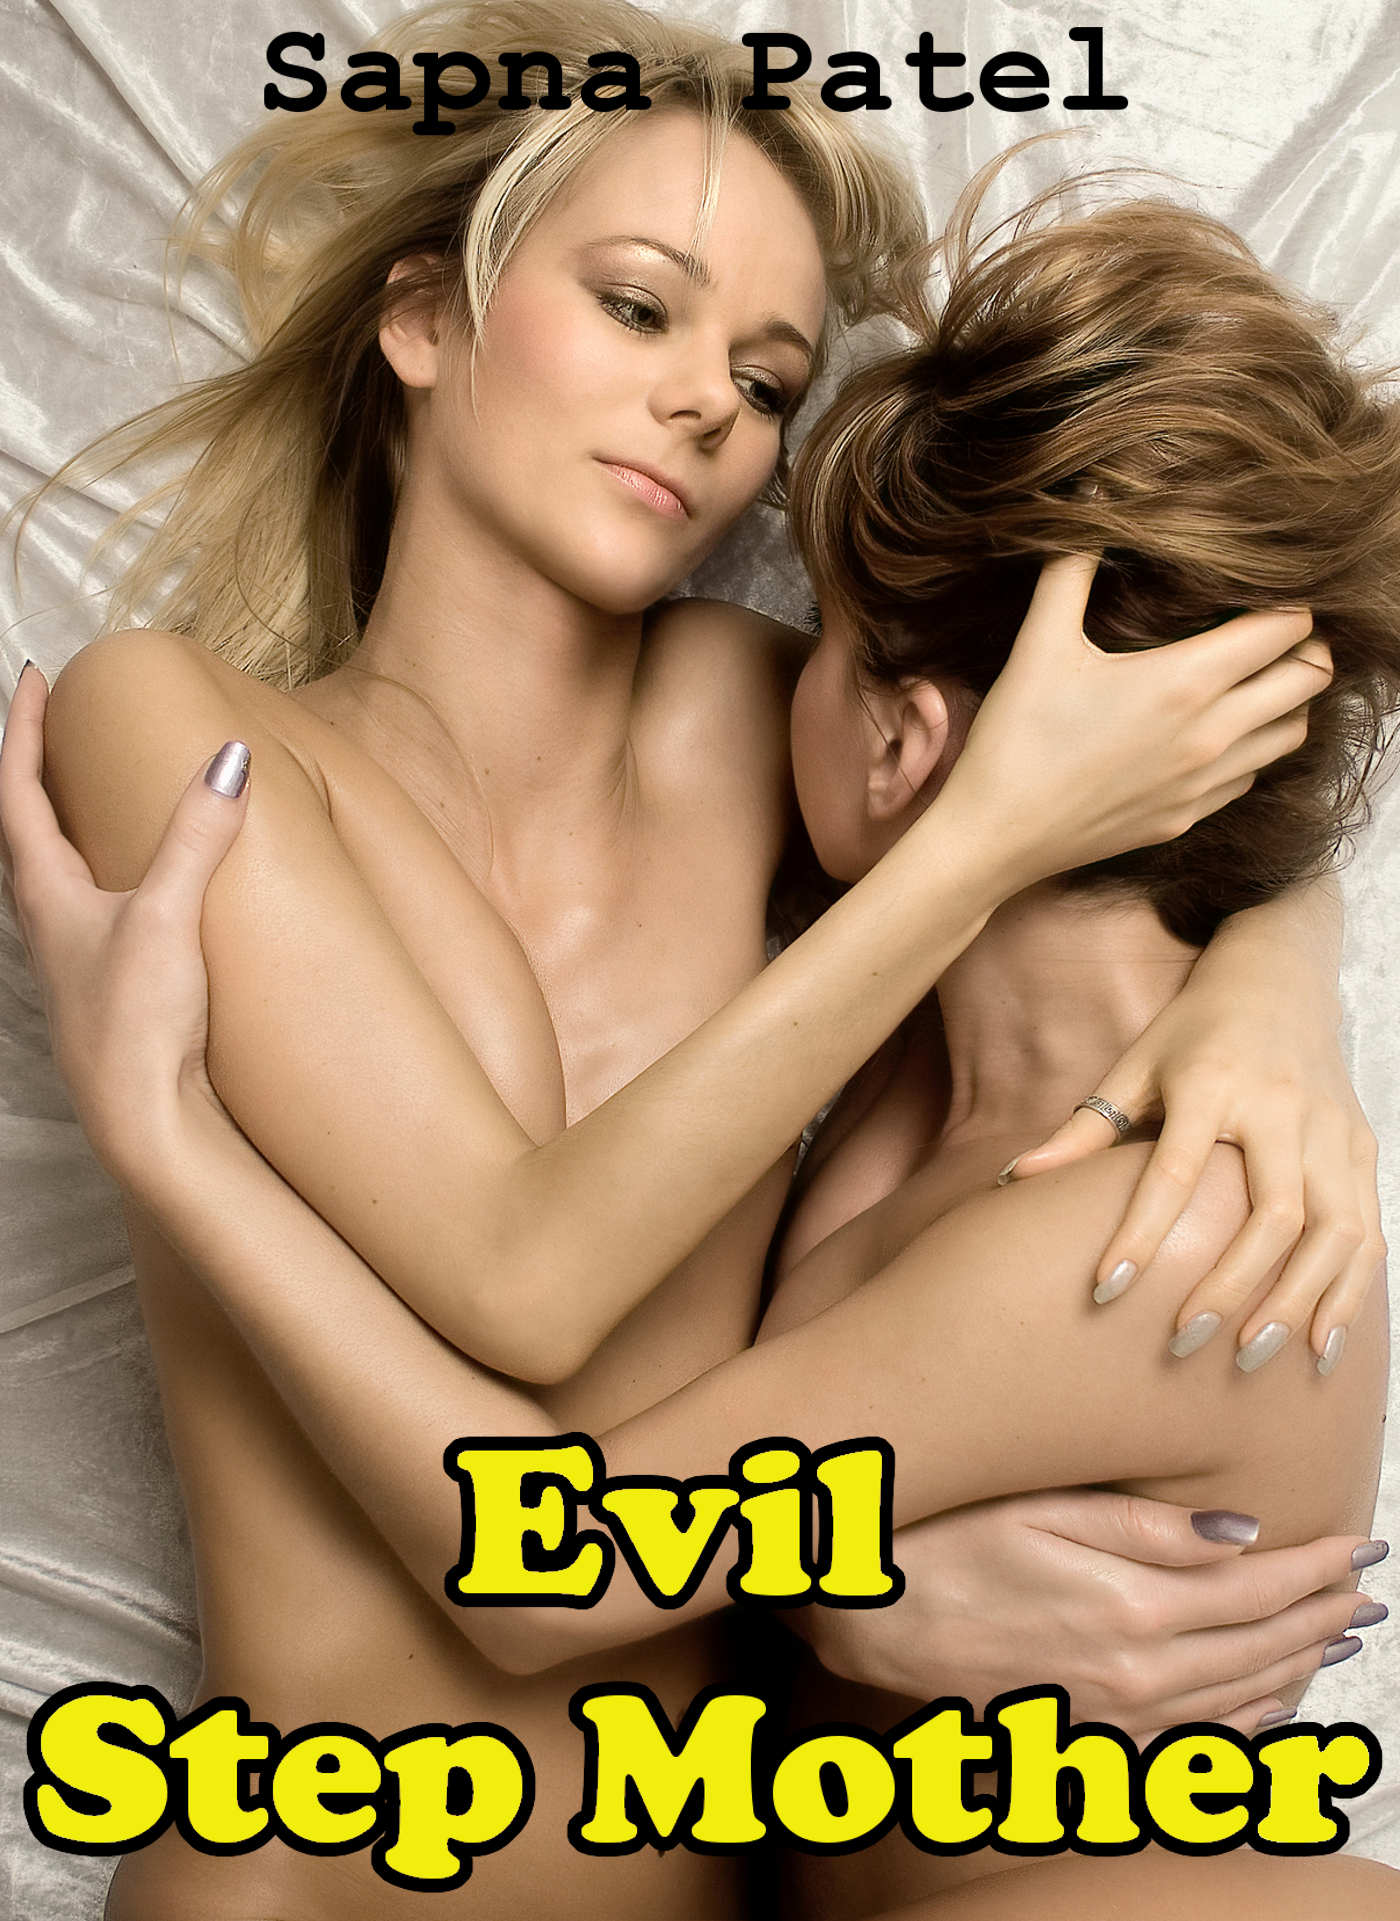 sex gamle kvinder taboo sex